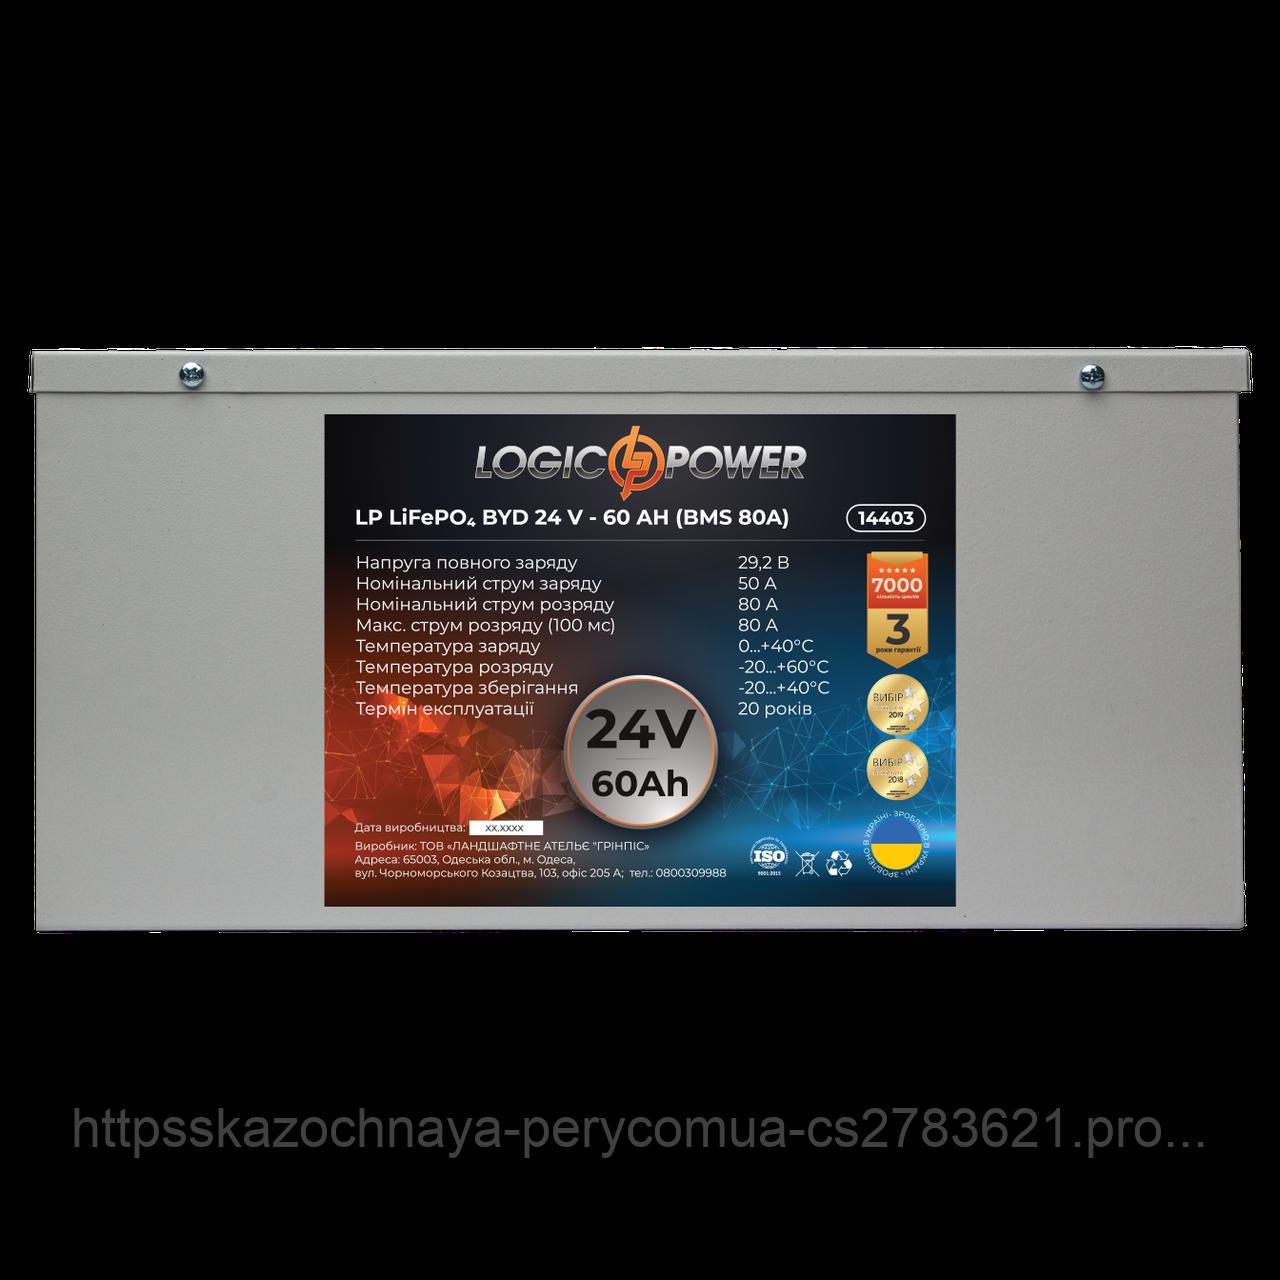 Аккумулятор LP LiFePO4 BYD 24V - 60 Ah (BMS 80А) металл